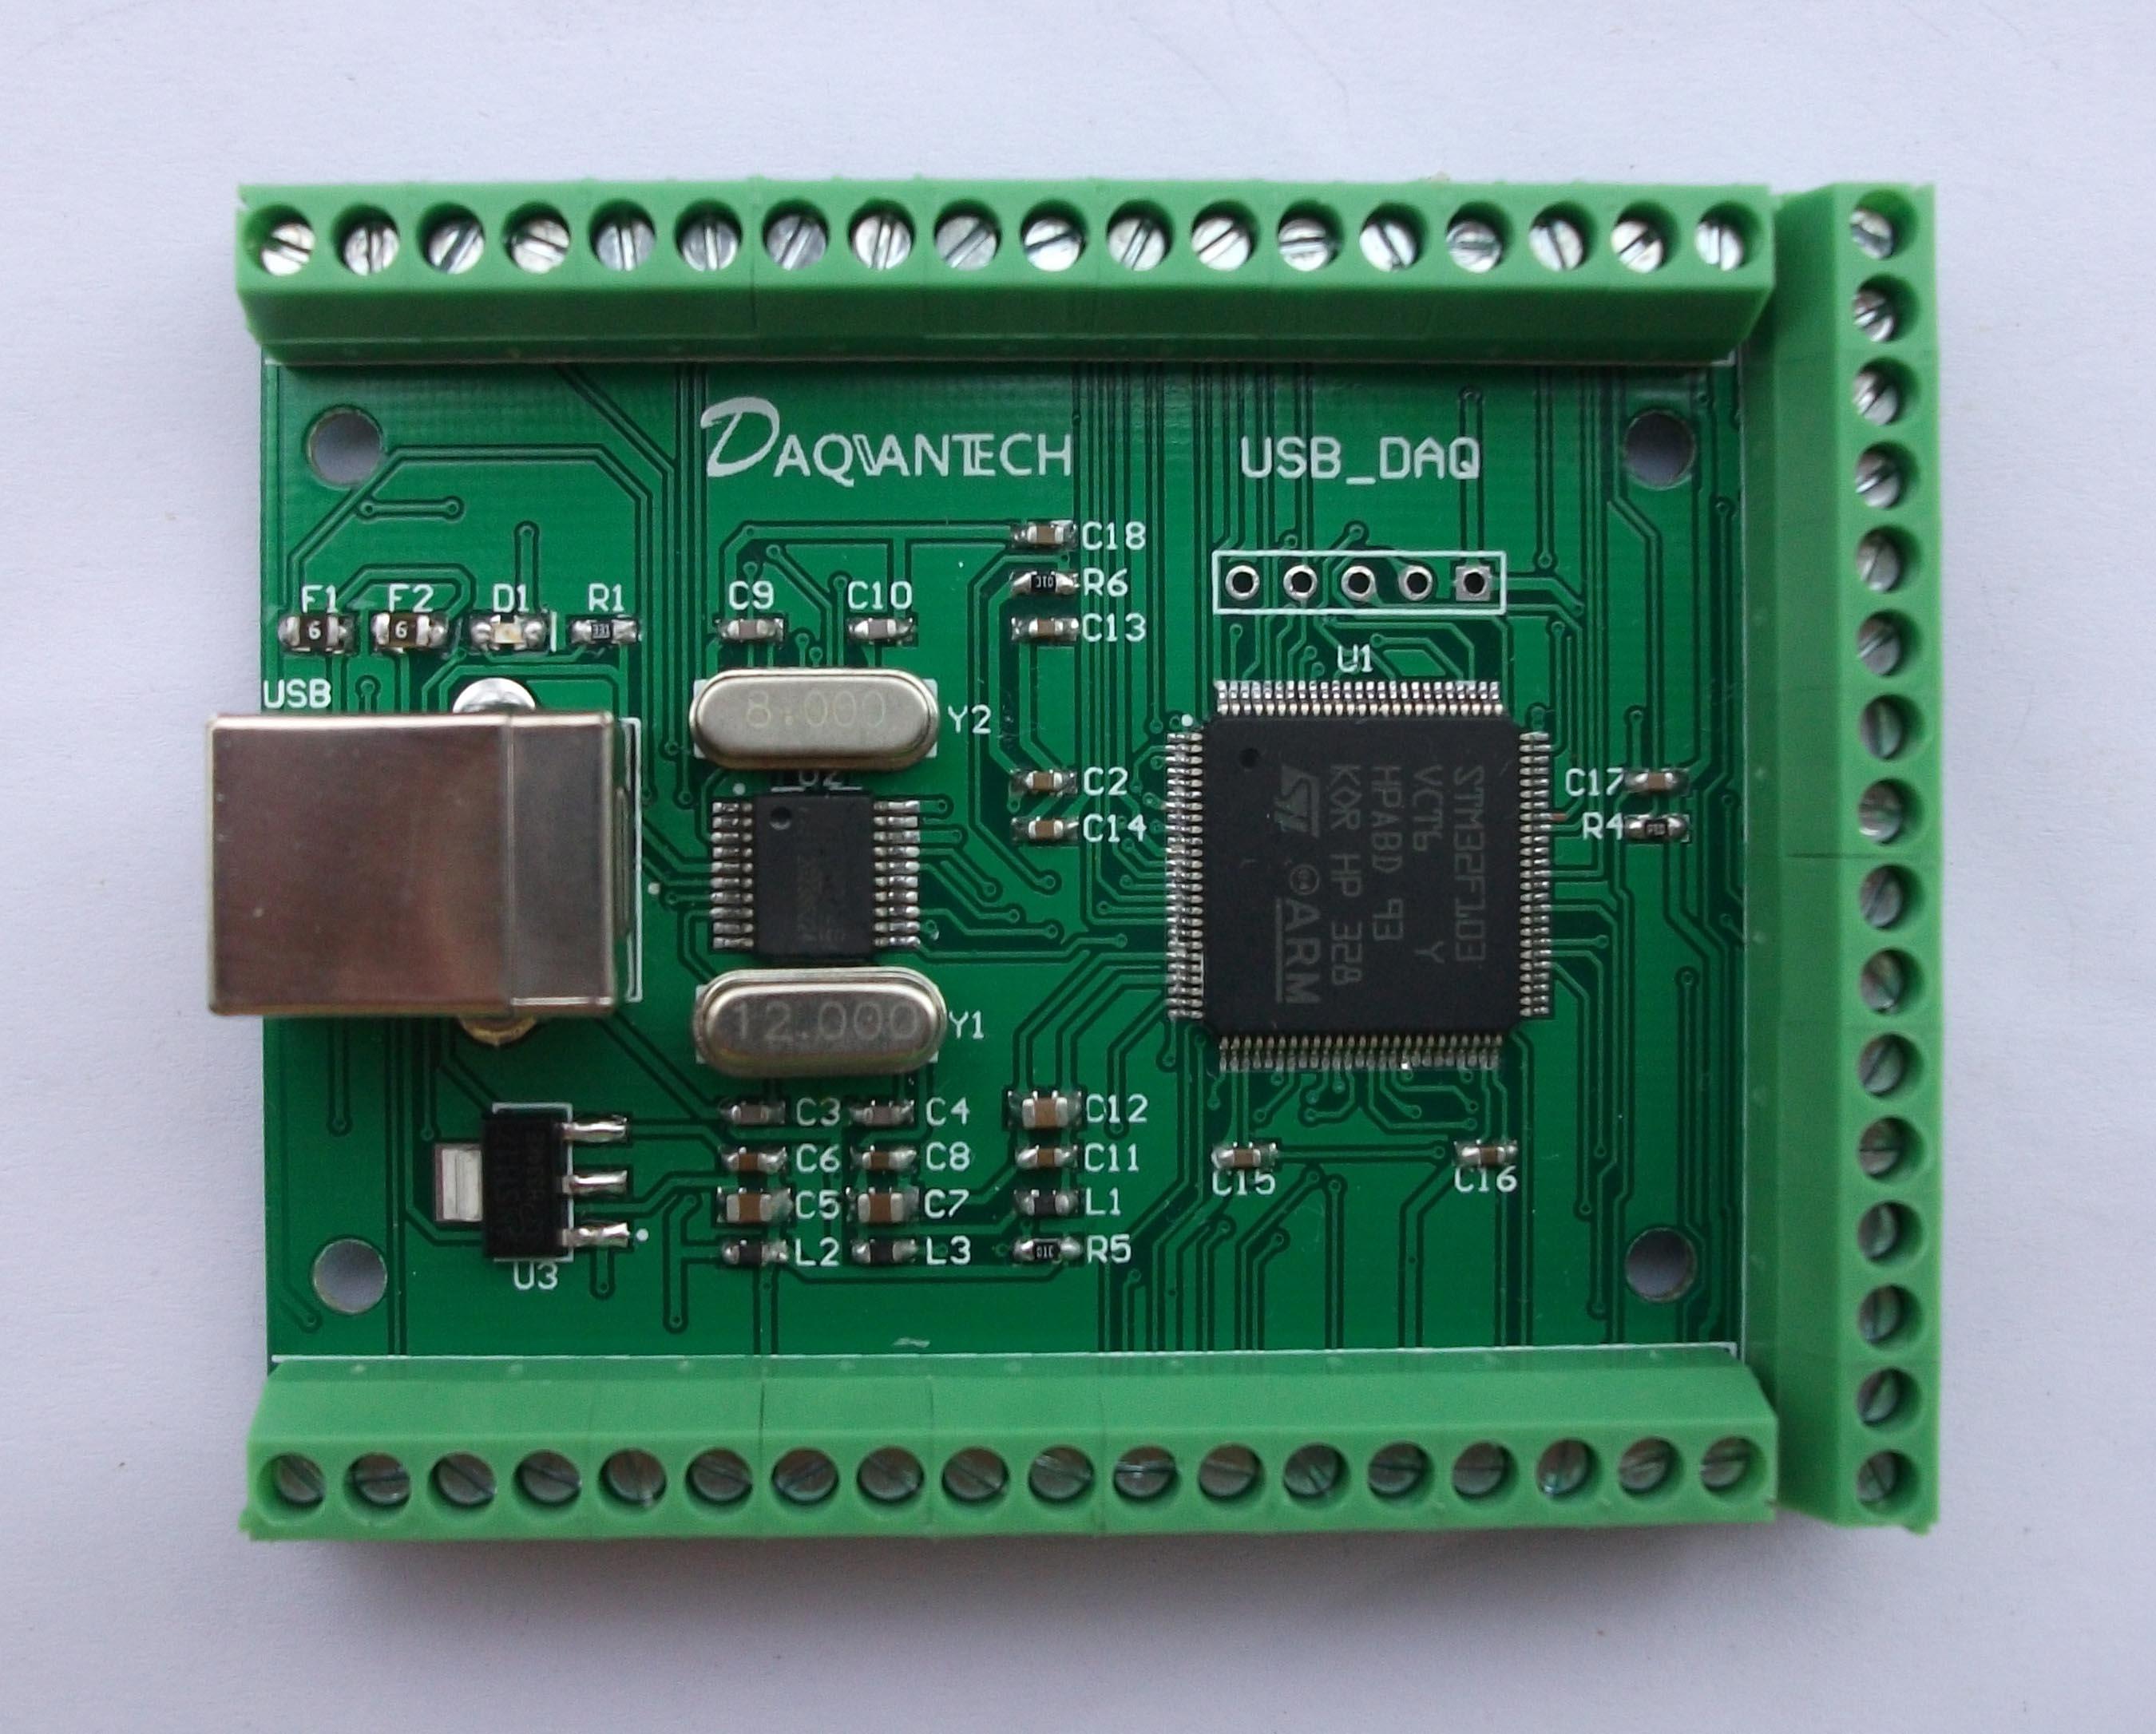 USB DAQ 12AD 2DA 8DI 8DO Data Acquisition Module Analog 3.3V Digital 2PWM Counter LabVIEW Matlab VC Codes Win10